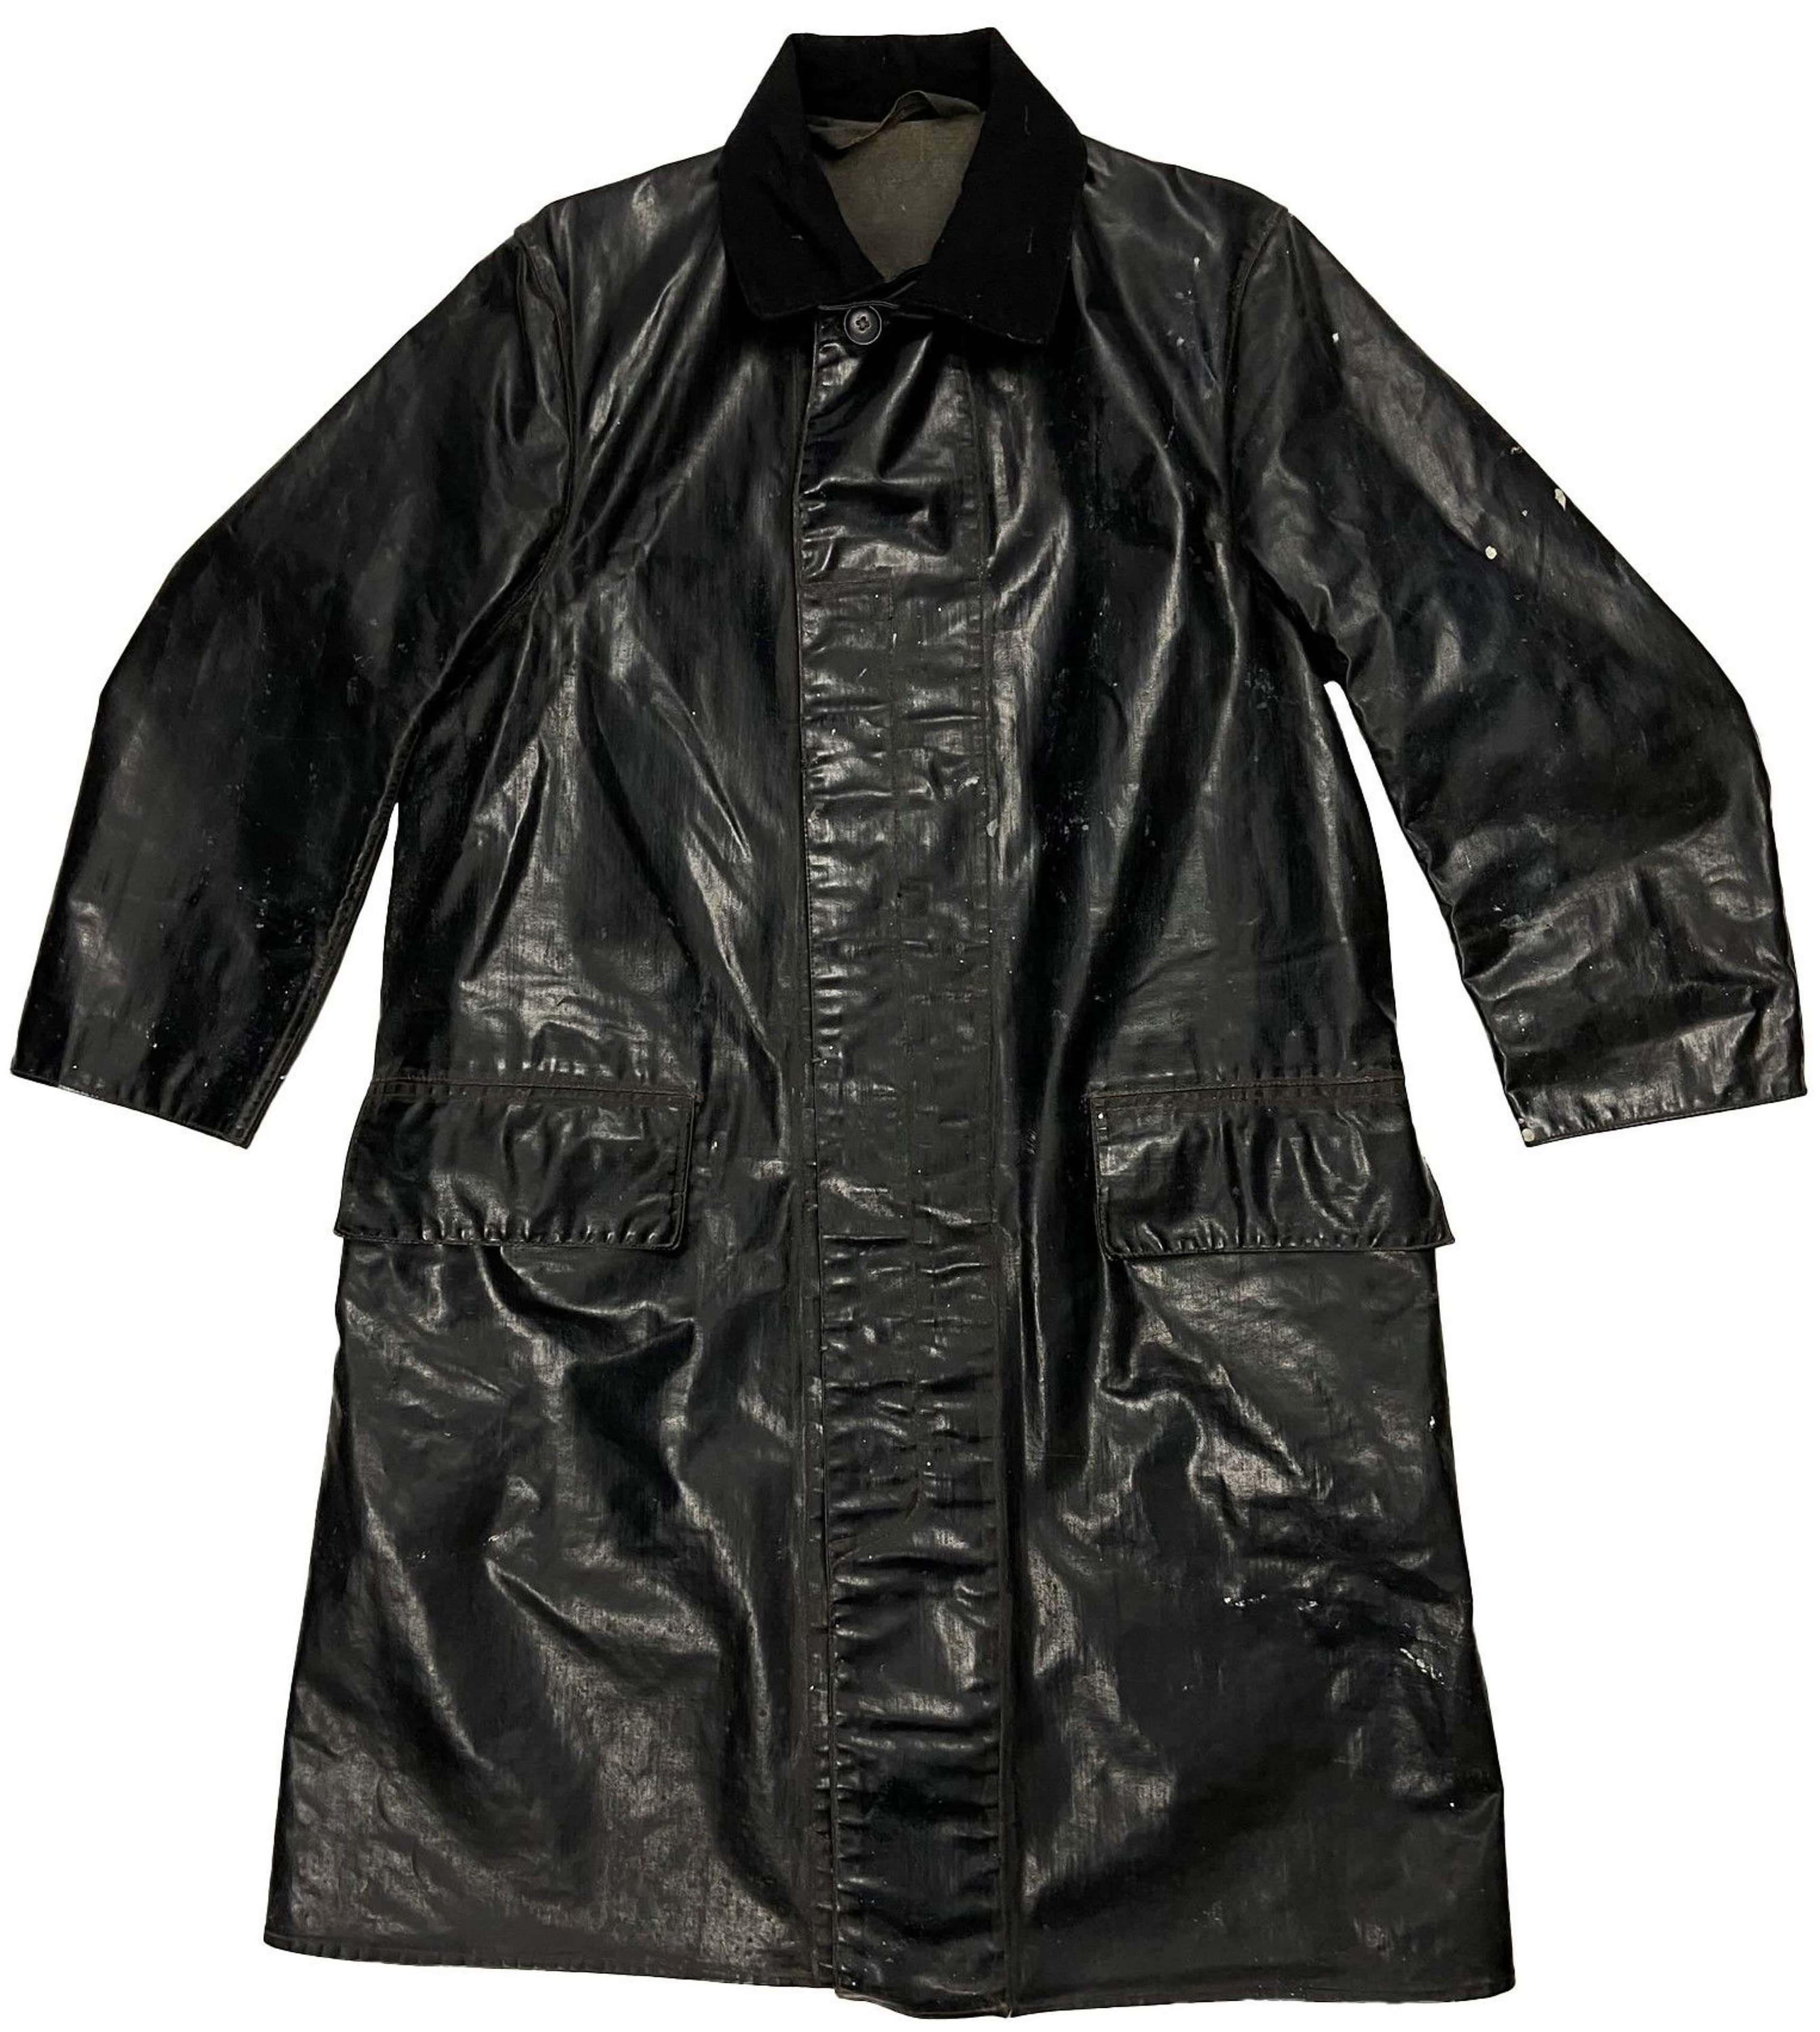 Original 1940s Royal Navy PVC Oilskin Waterproof Coat